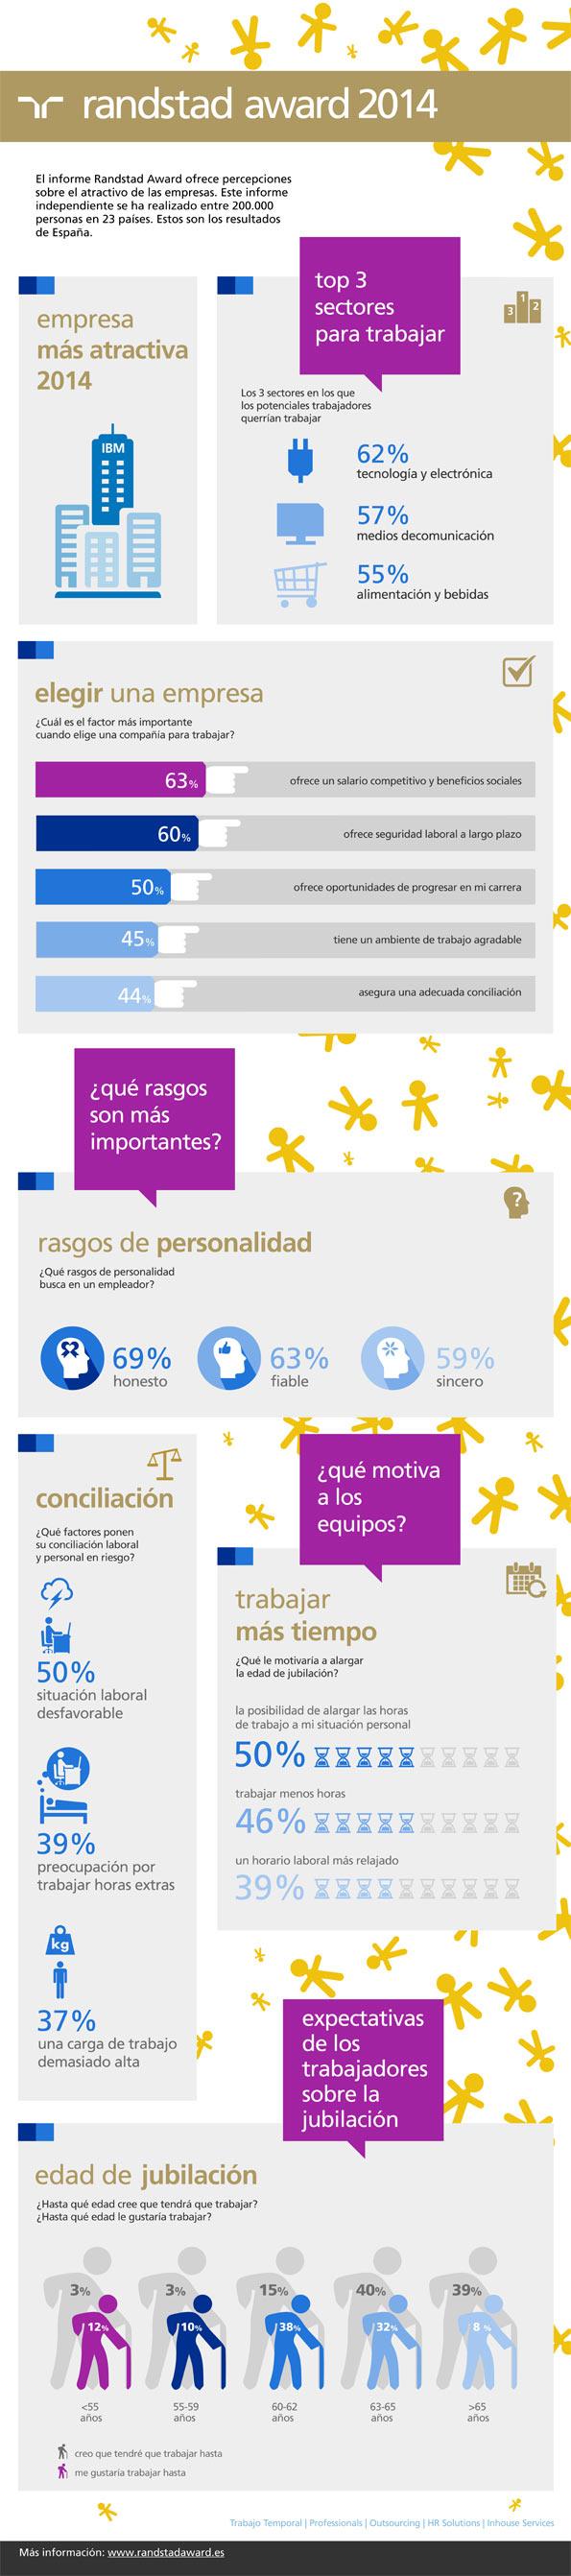 infografia-award-2014